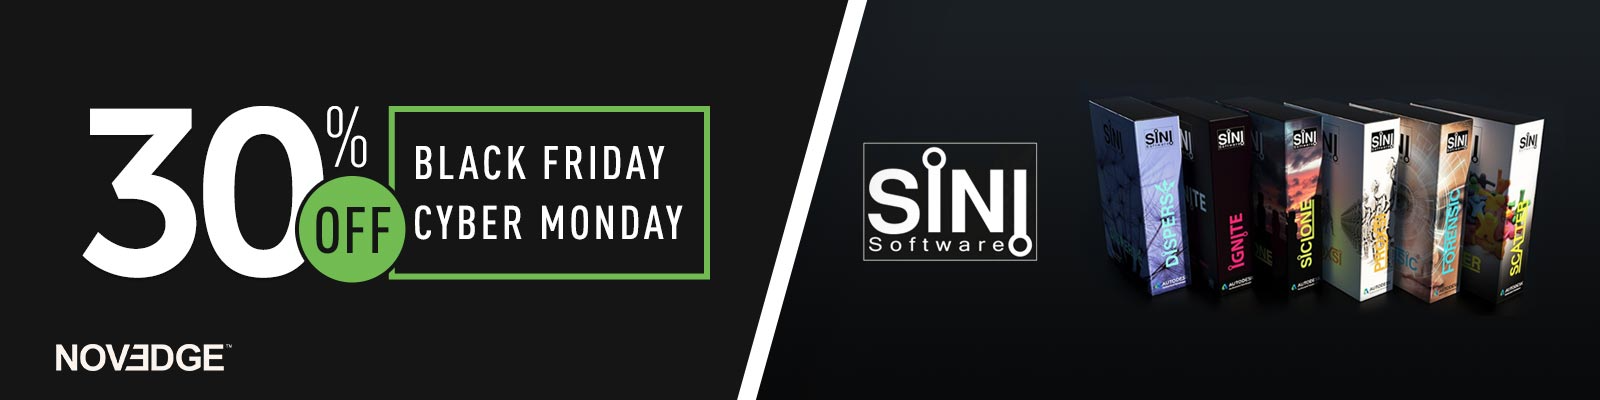 SiNi Software